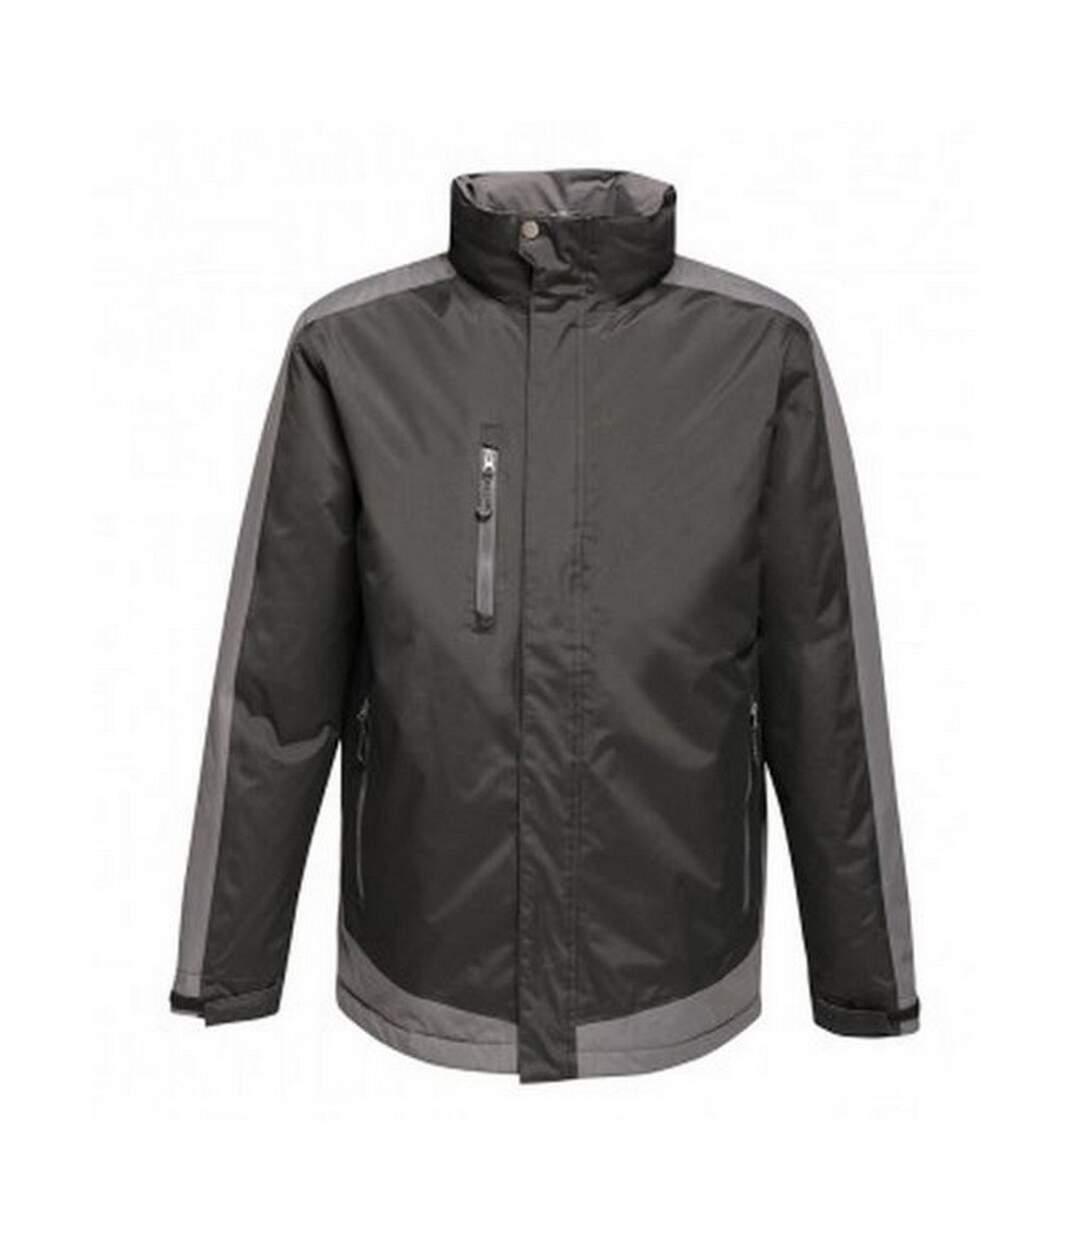 Regatta Mens Contrast Insulated Jacket (Seal Grey/Black) - UTPC3315